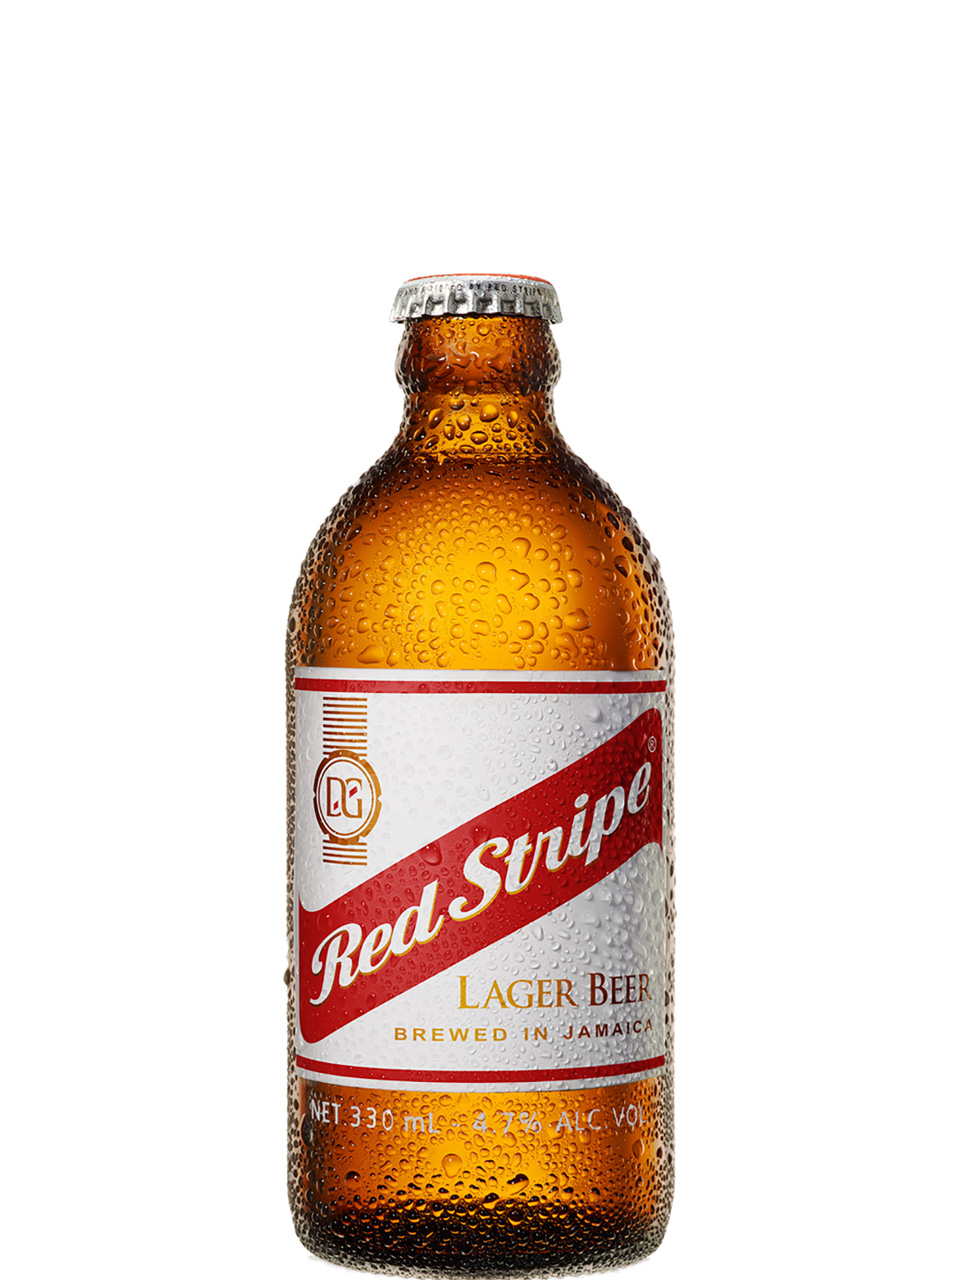 Red Stripe Lager Beer 6 Pack Bottles